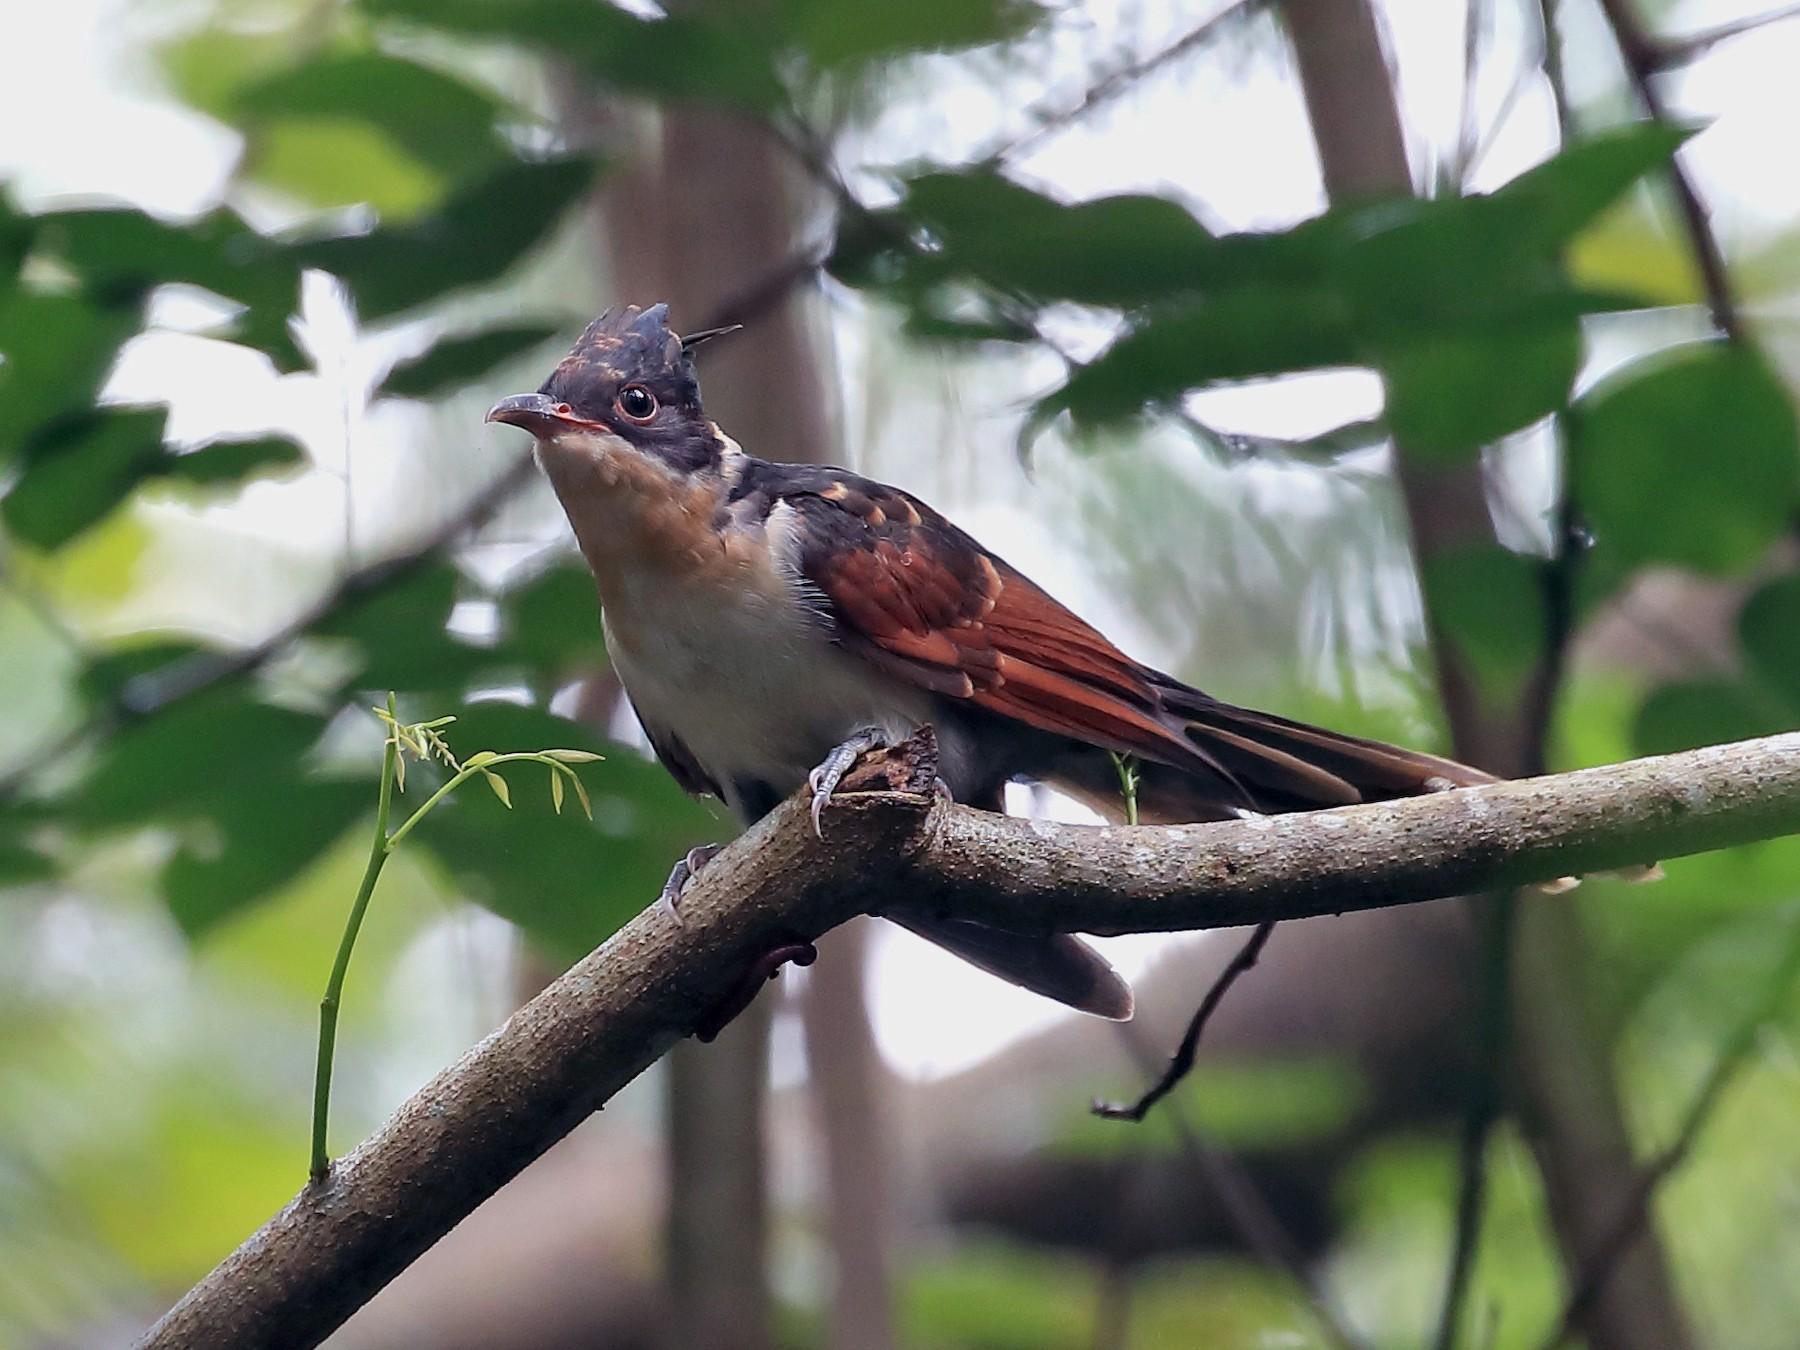 Chestnut-winged Cuckoo - Chun Fai LO